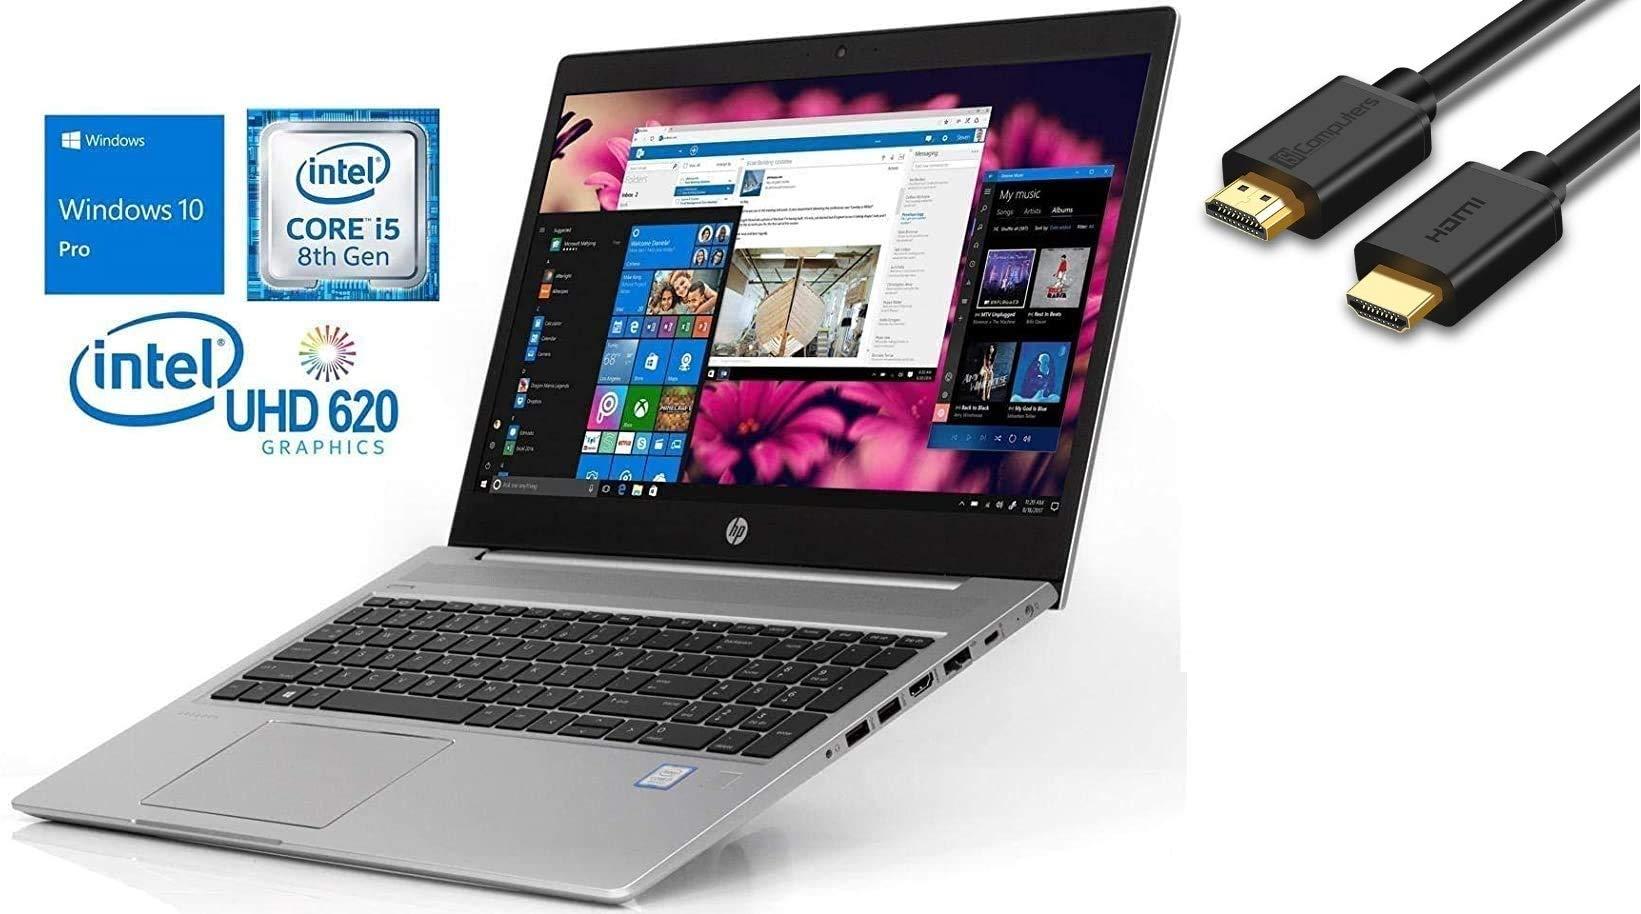 "2019 HP Probook 450 G6 15.6"" HD Business Laptop (Intel Quad-Core i5-8265U, 8GB DDR4 RAM, 256GB PCIe NVMe M.2 SSD, UHD 620) USB Type-C, RJ45, HDMI, Windows 10 Pro Professional"